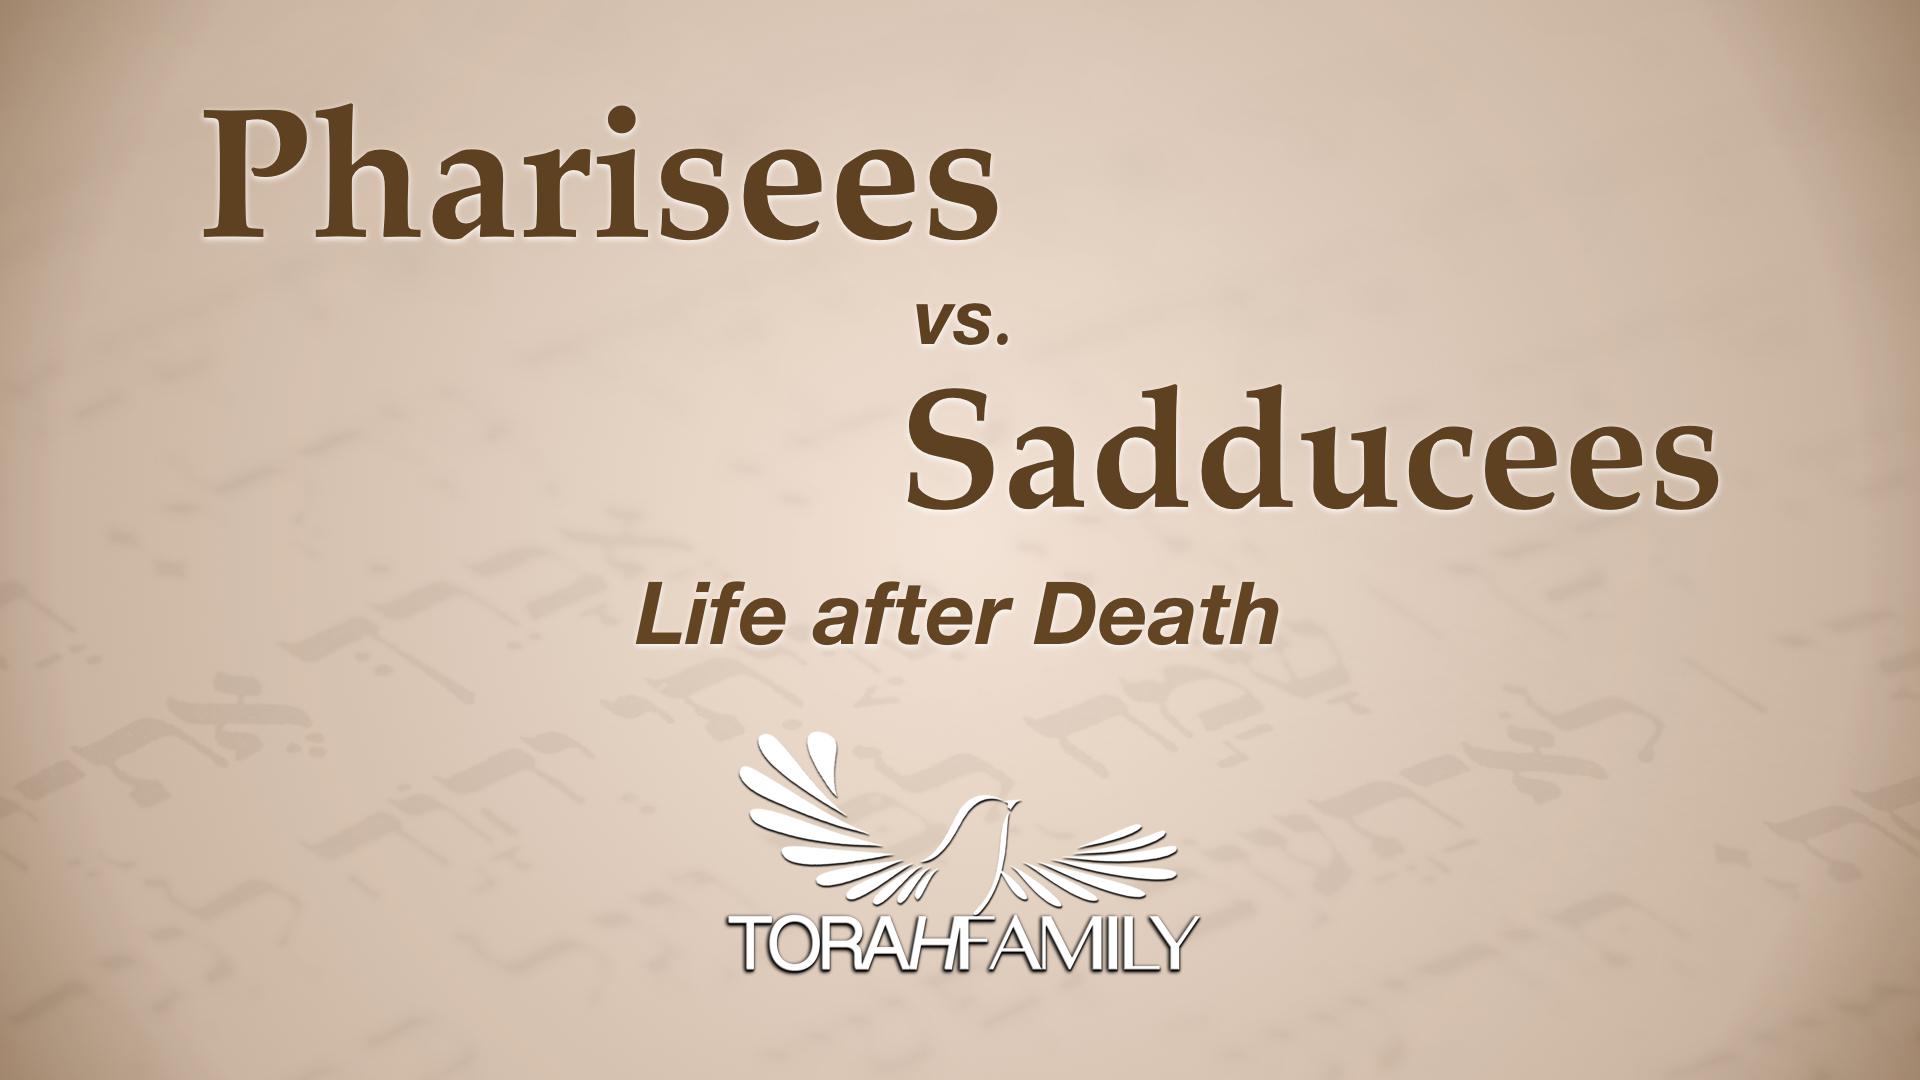 Pharisees vs Sadducees  Life after Death  Torah Family